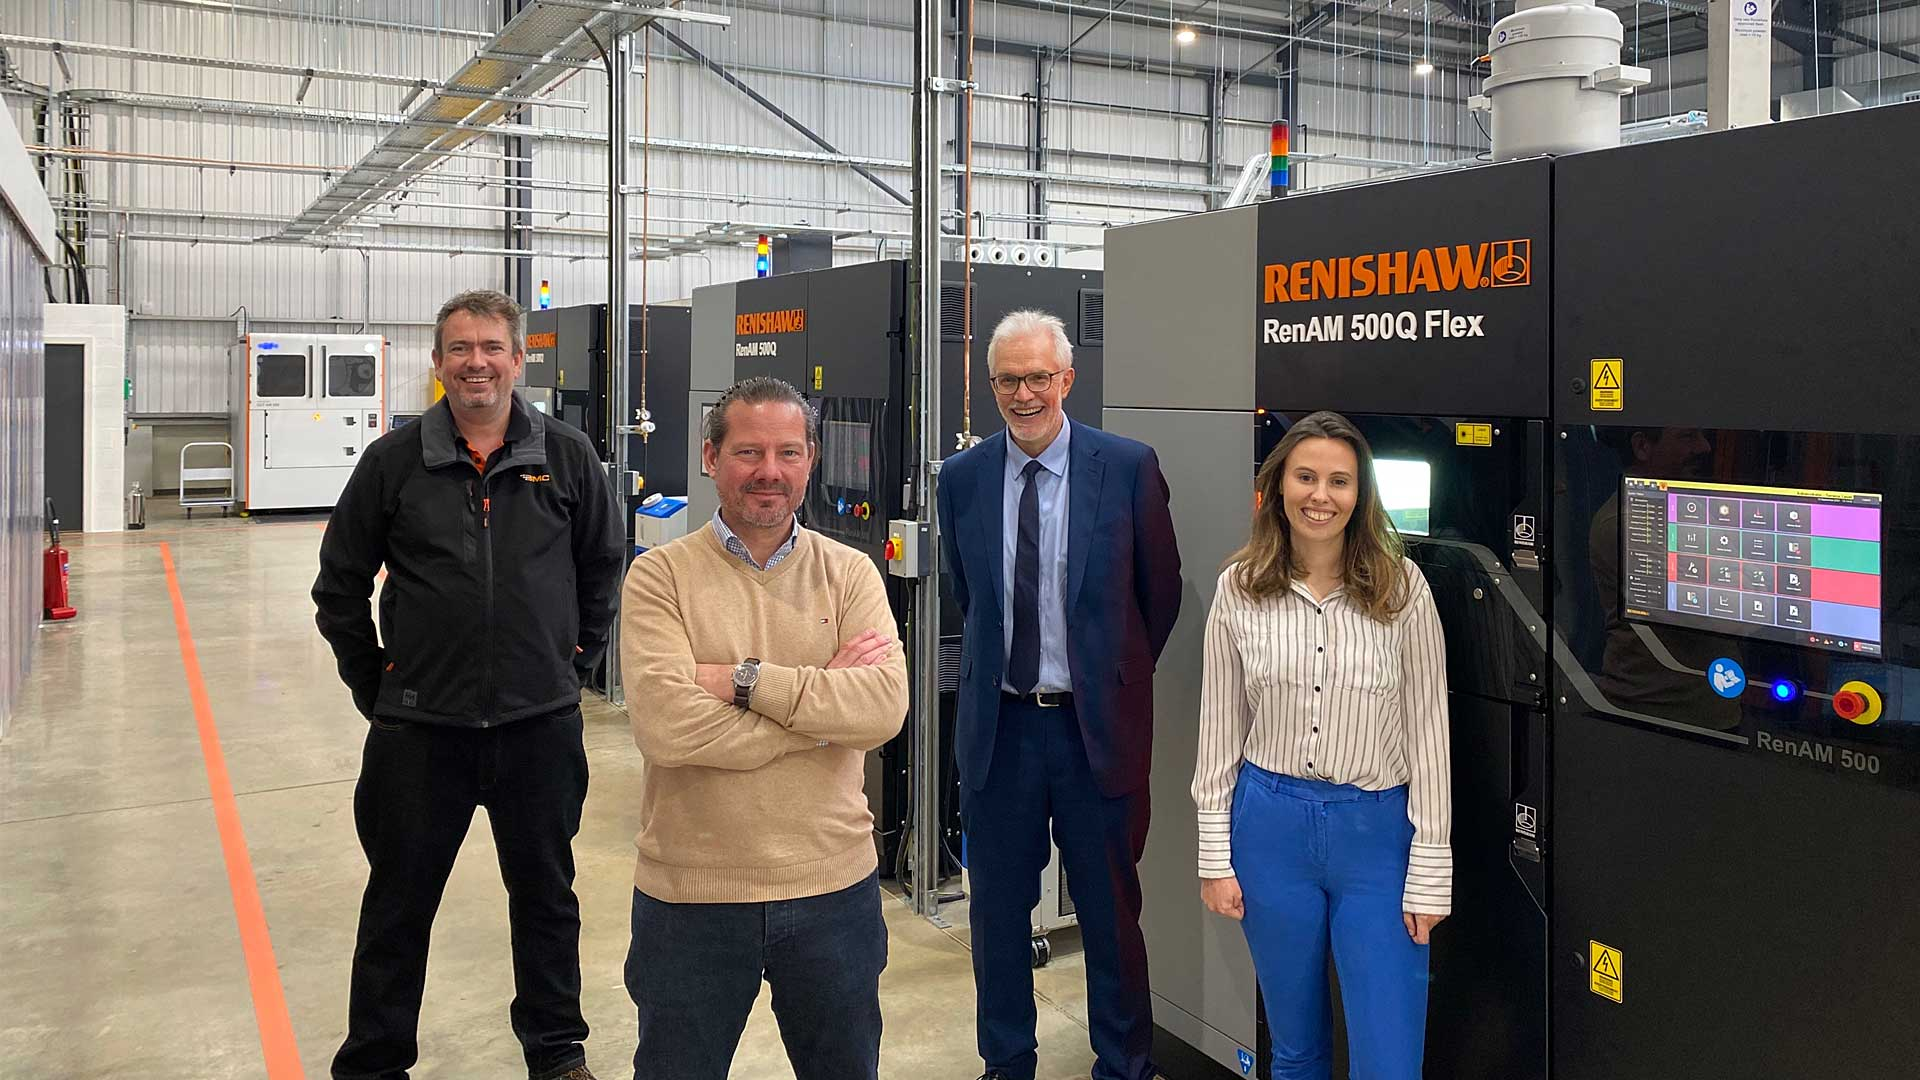 DMC first to test new 'flexible' Renishaw AM machine